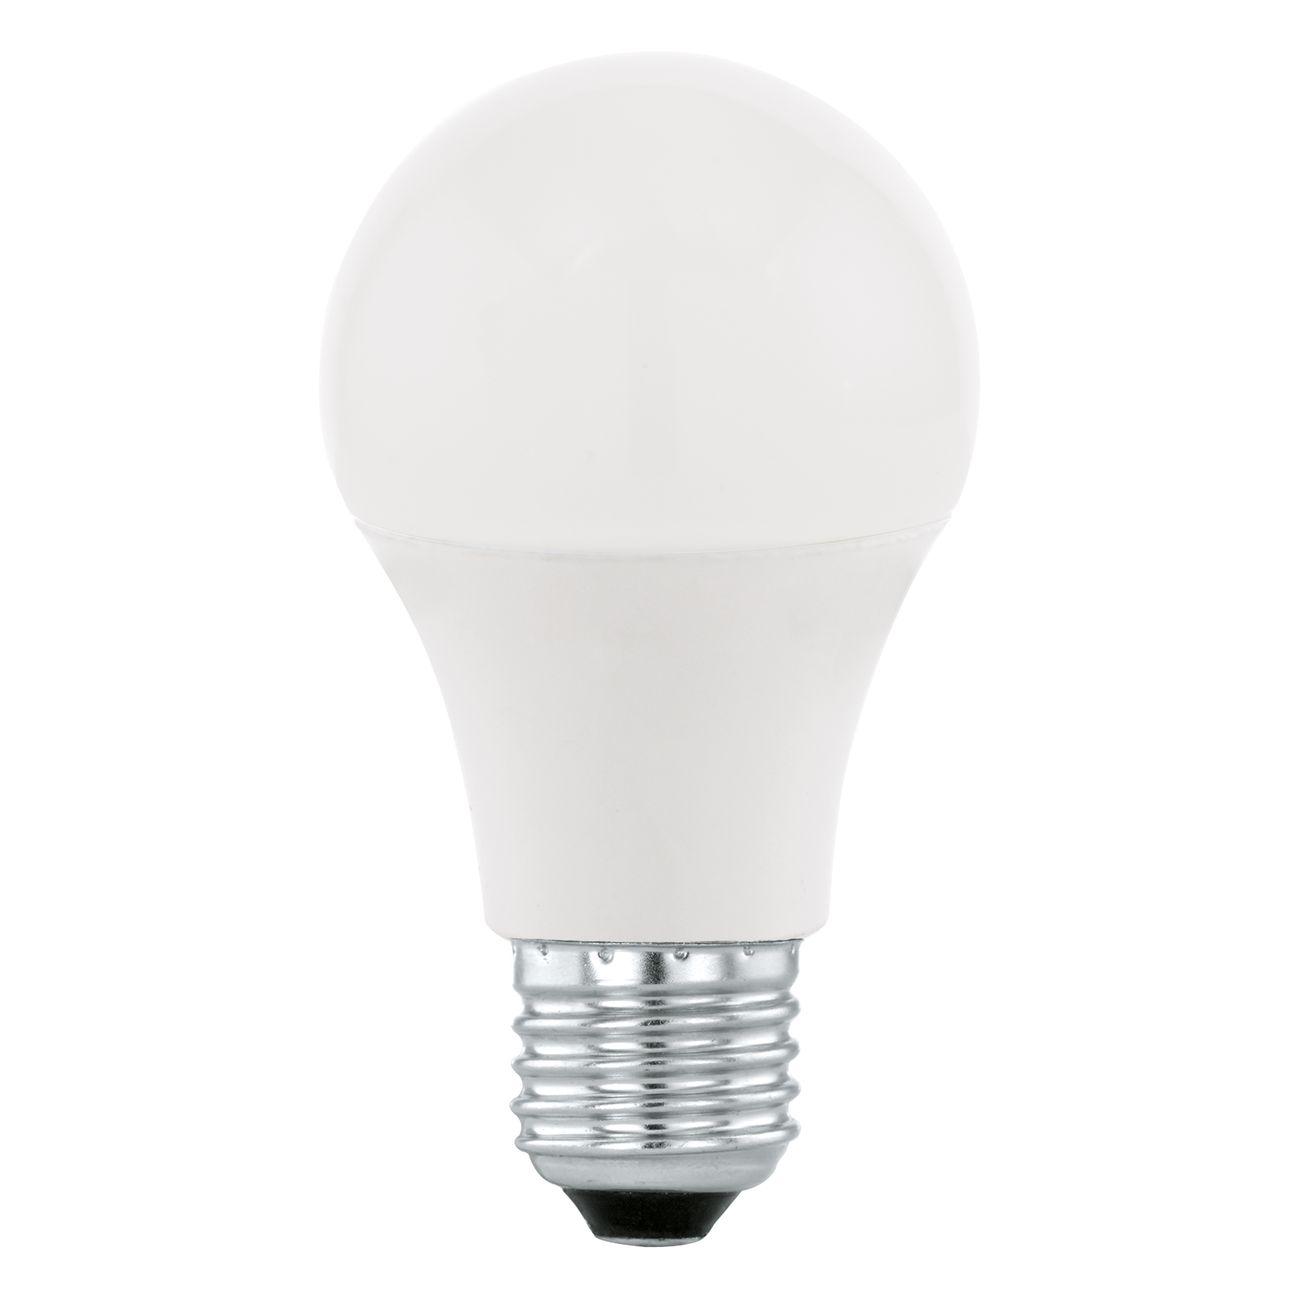 Eglo LED žárovka, E27, 9W, teplá bílá LM LED E27